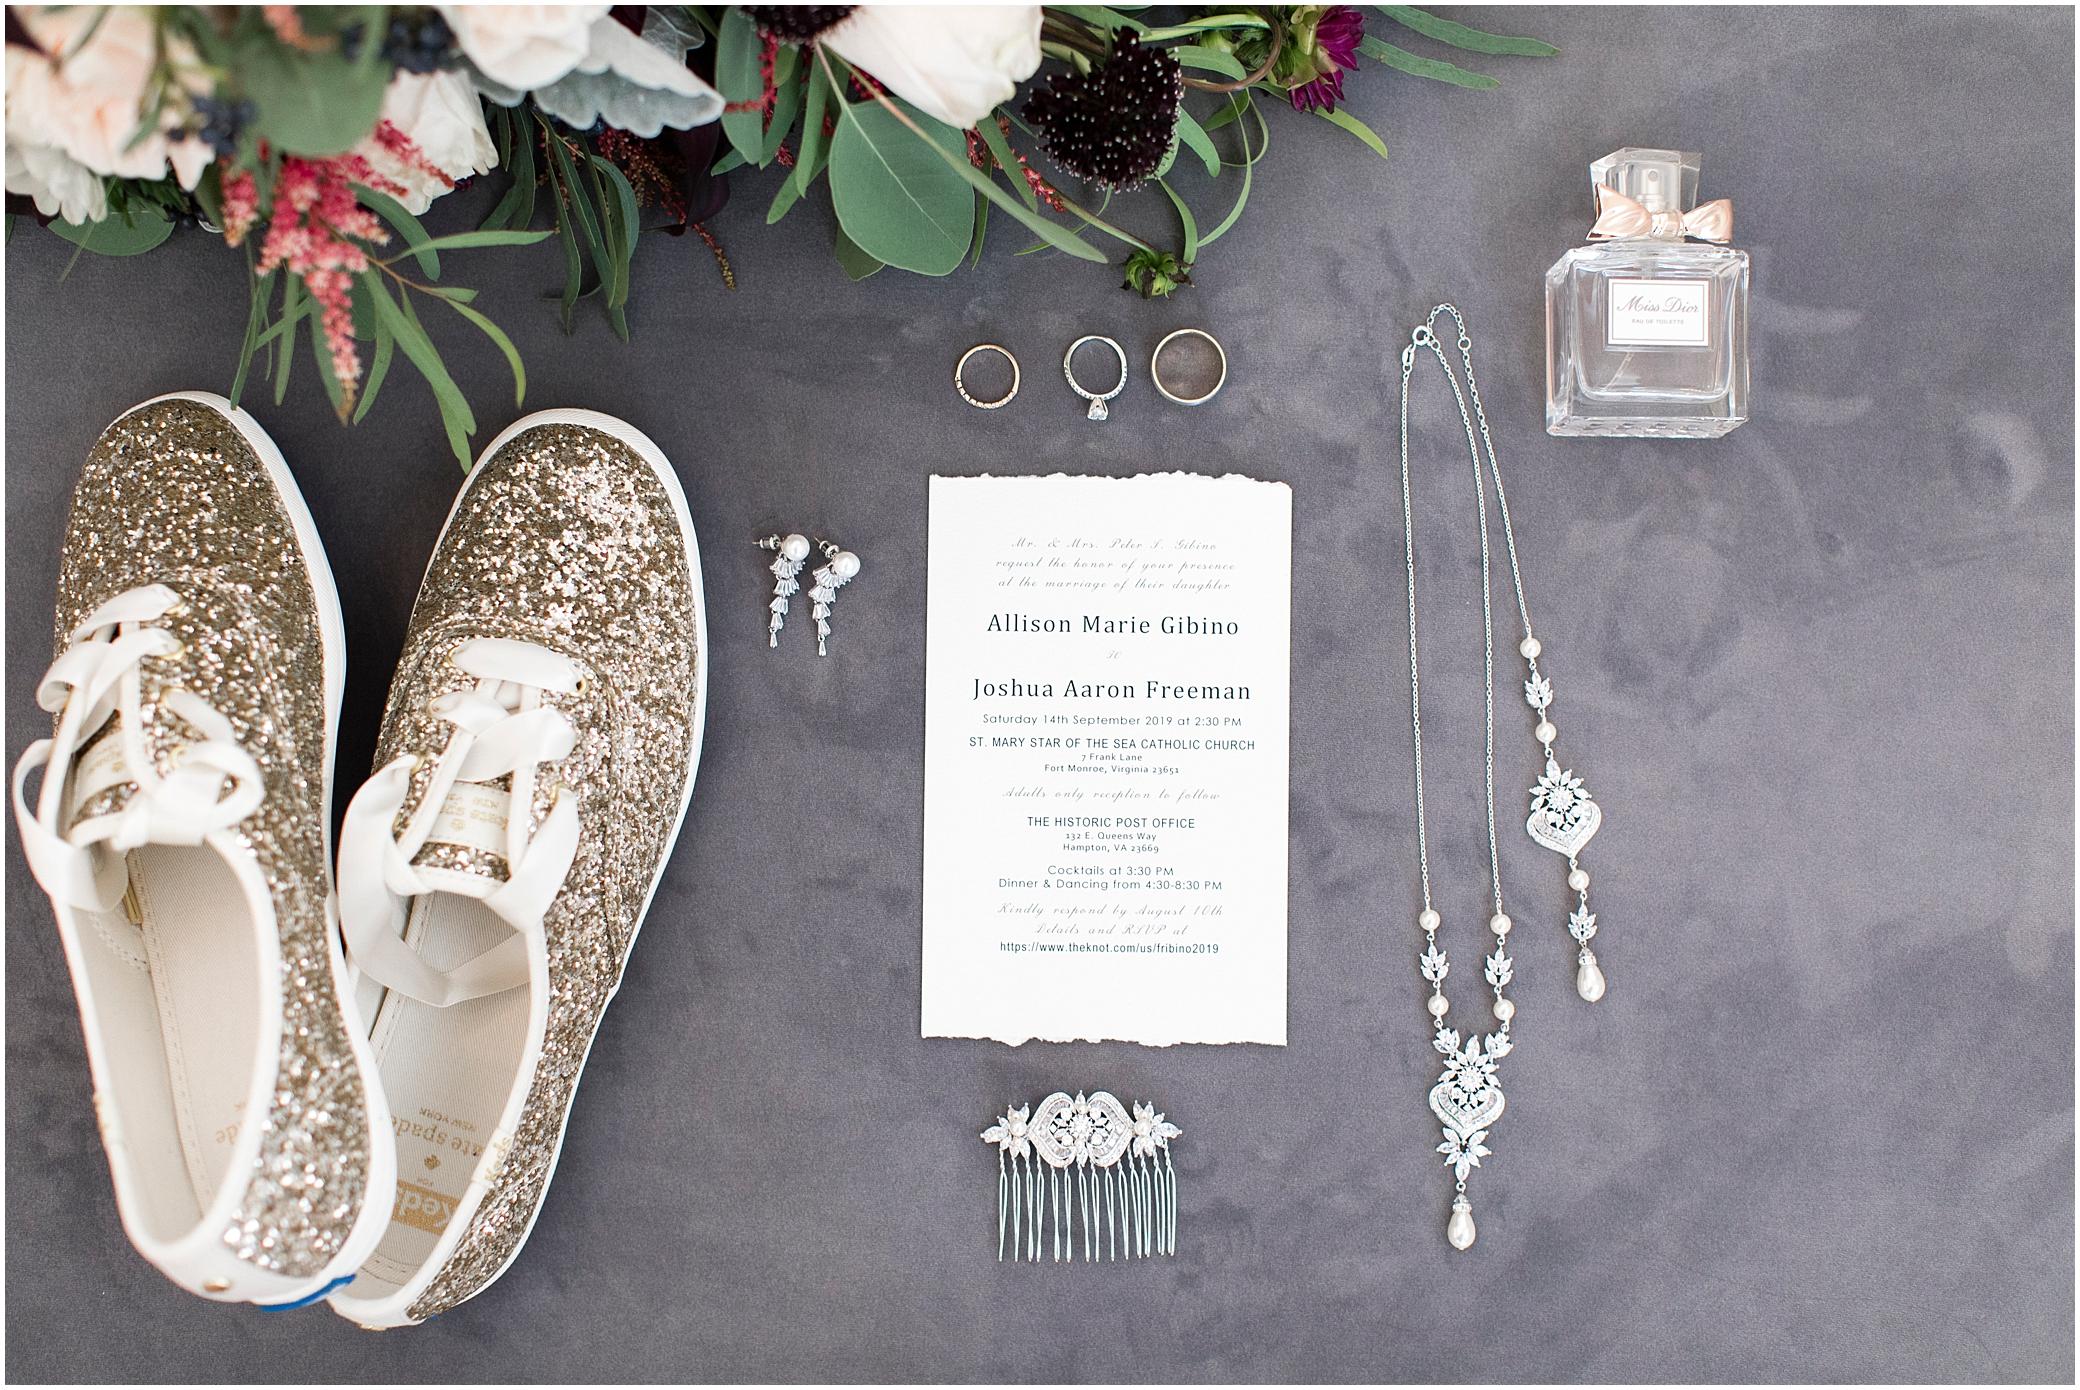 historic post office wedding bride details